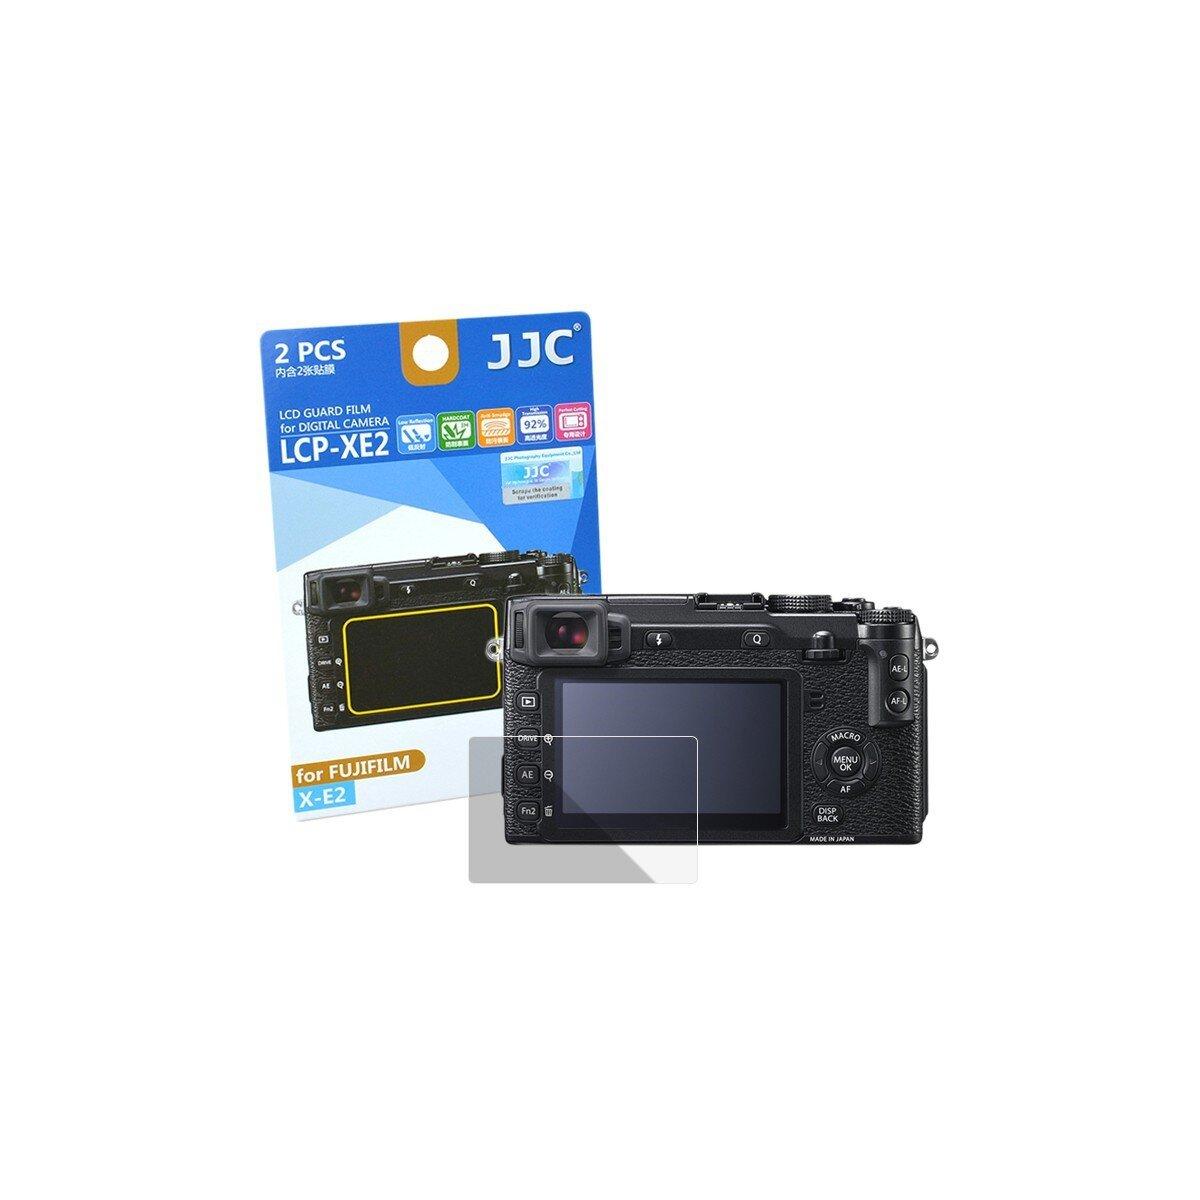 JJC Displayschutzfolie Screen Protector Kratzschutz passgenau kompatibel für Fujifilm X-E2 - LCP-XE2